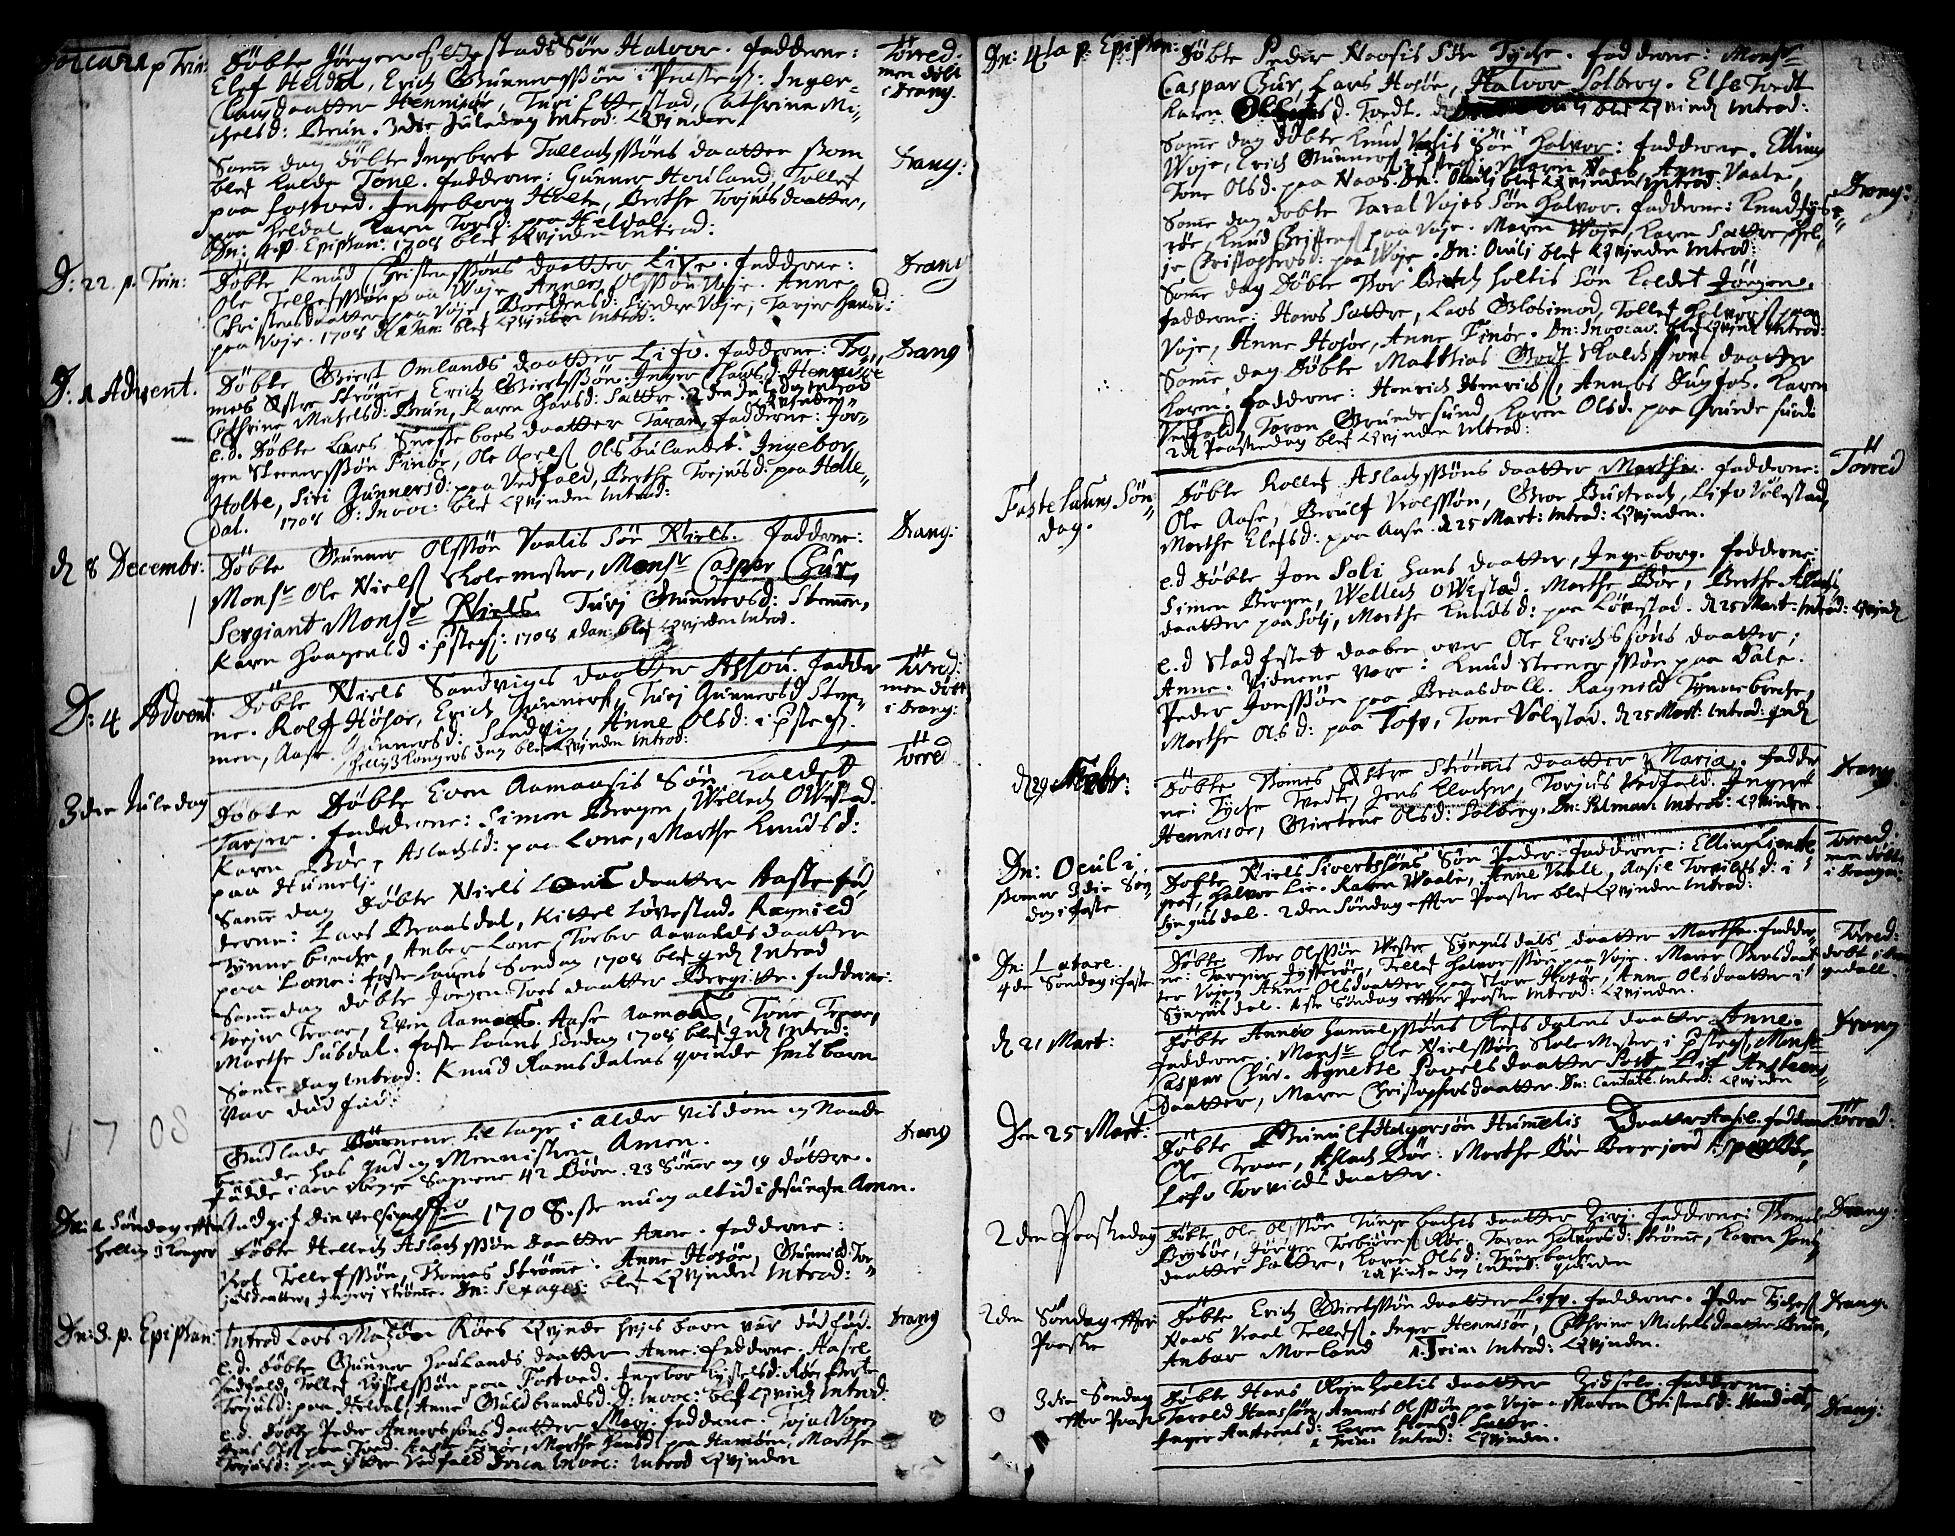 SAKO, Drangedal kirkebøker, F/Fa/L0001: Ministerialbok nr. 1, 1697-1767, s. 20